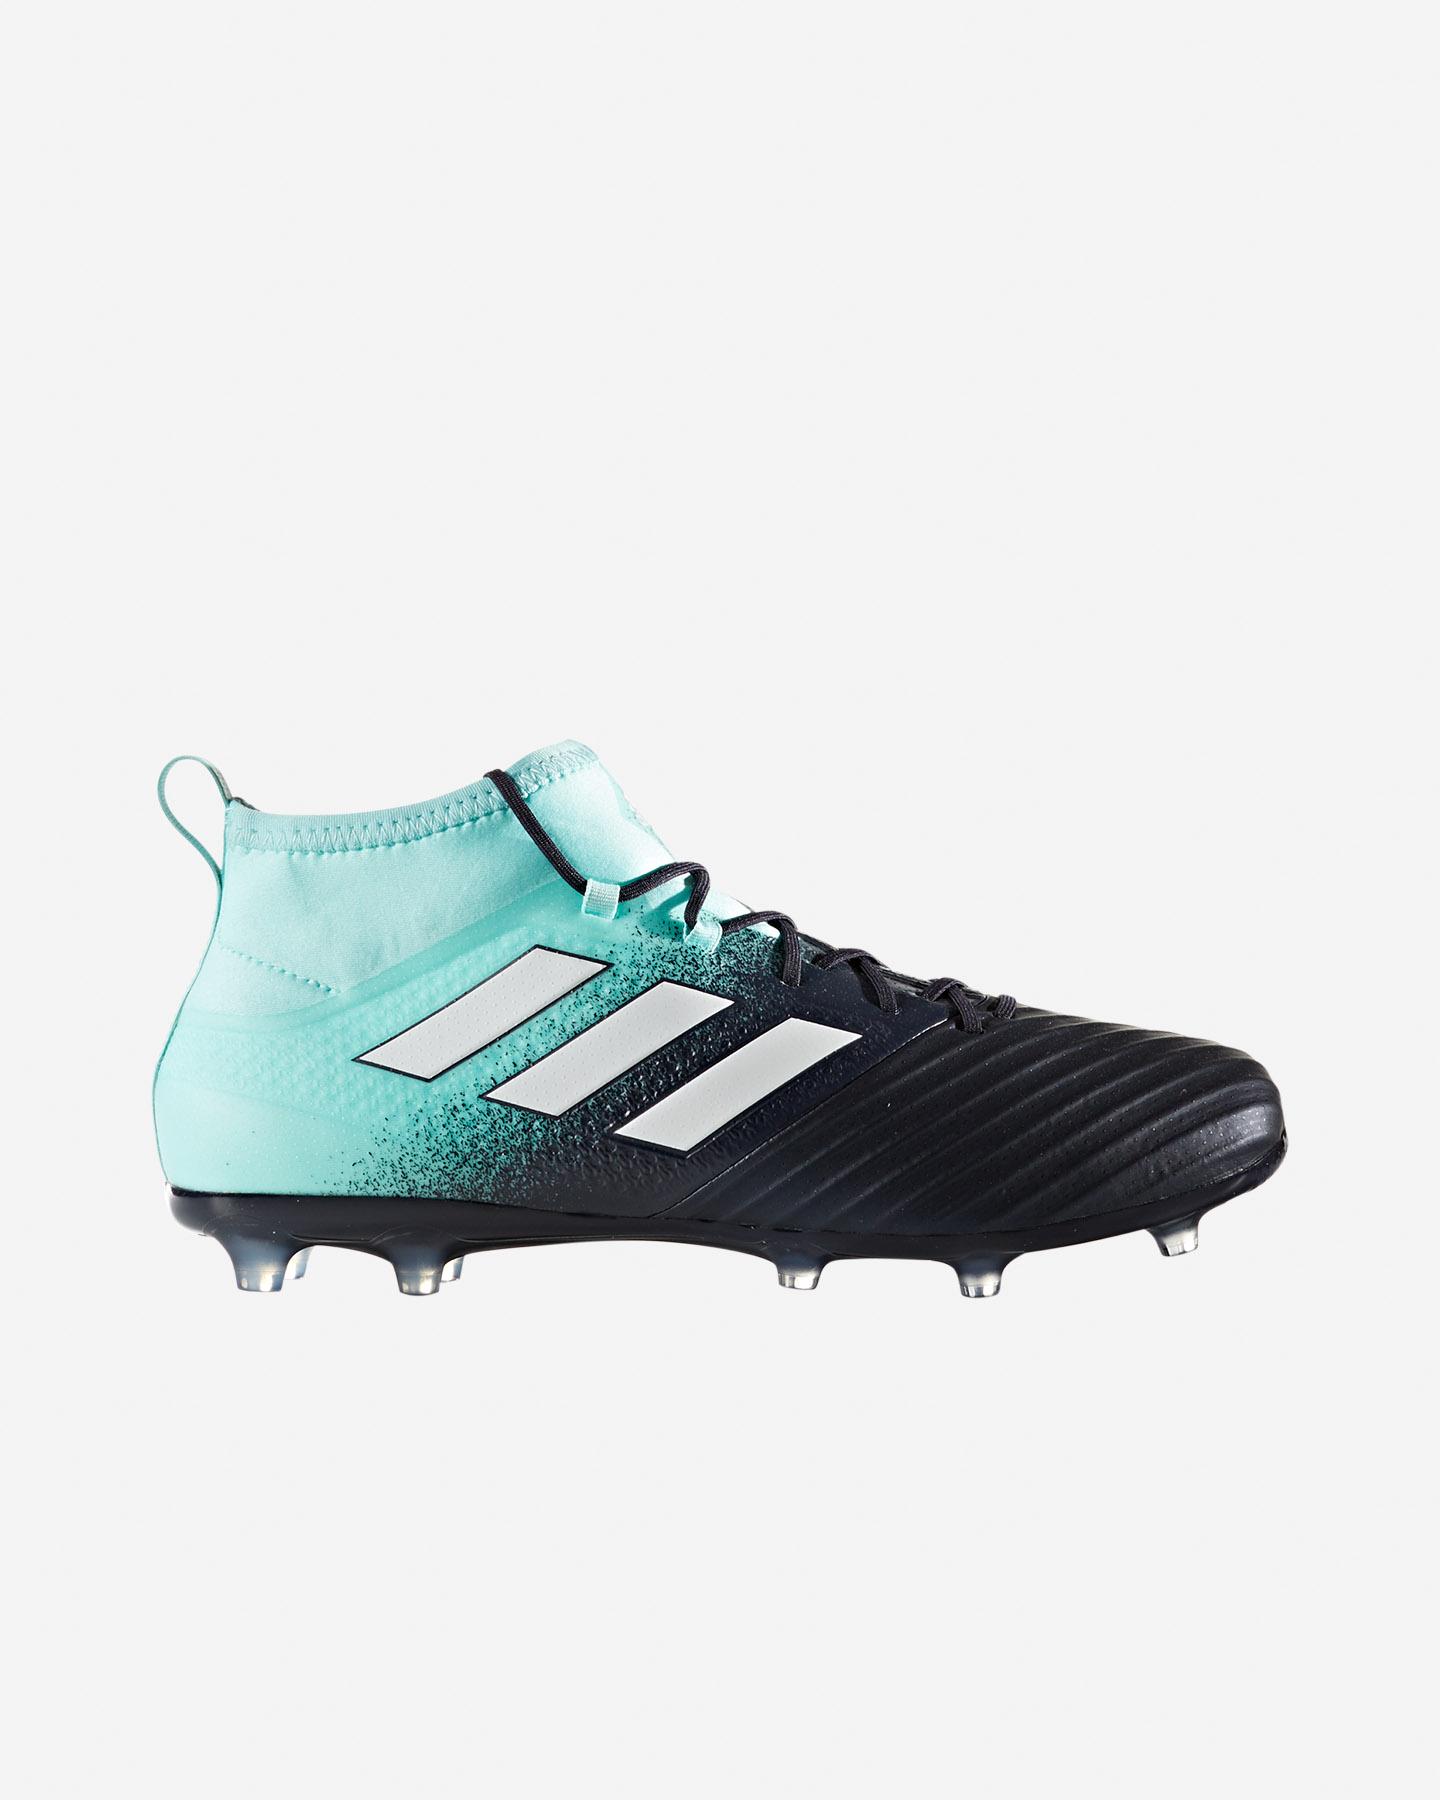 Sport 17 Cisalfa Ace Su Calcio S77055 Fg M Izq7rw 2 Adidas Scarpe AdqfH4xAtn